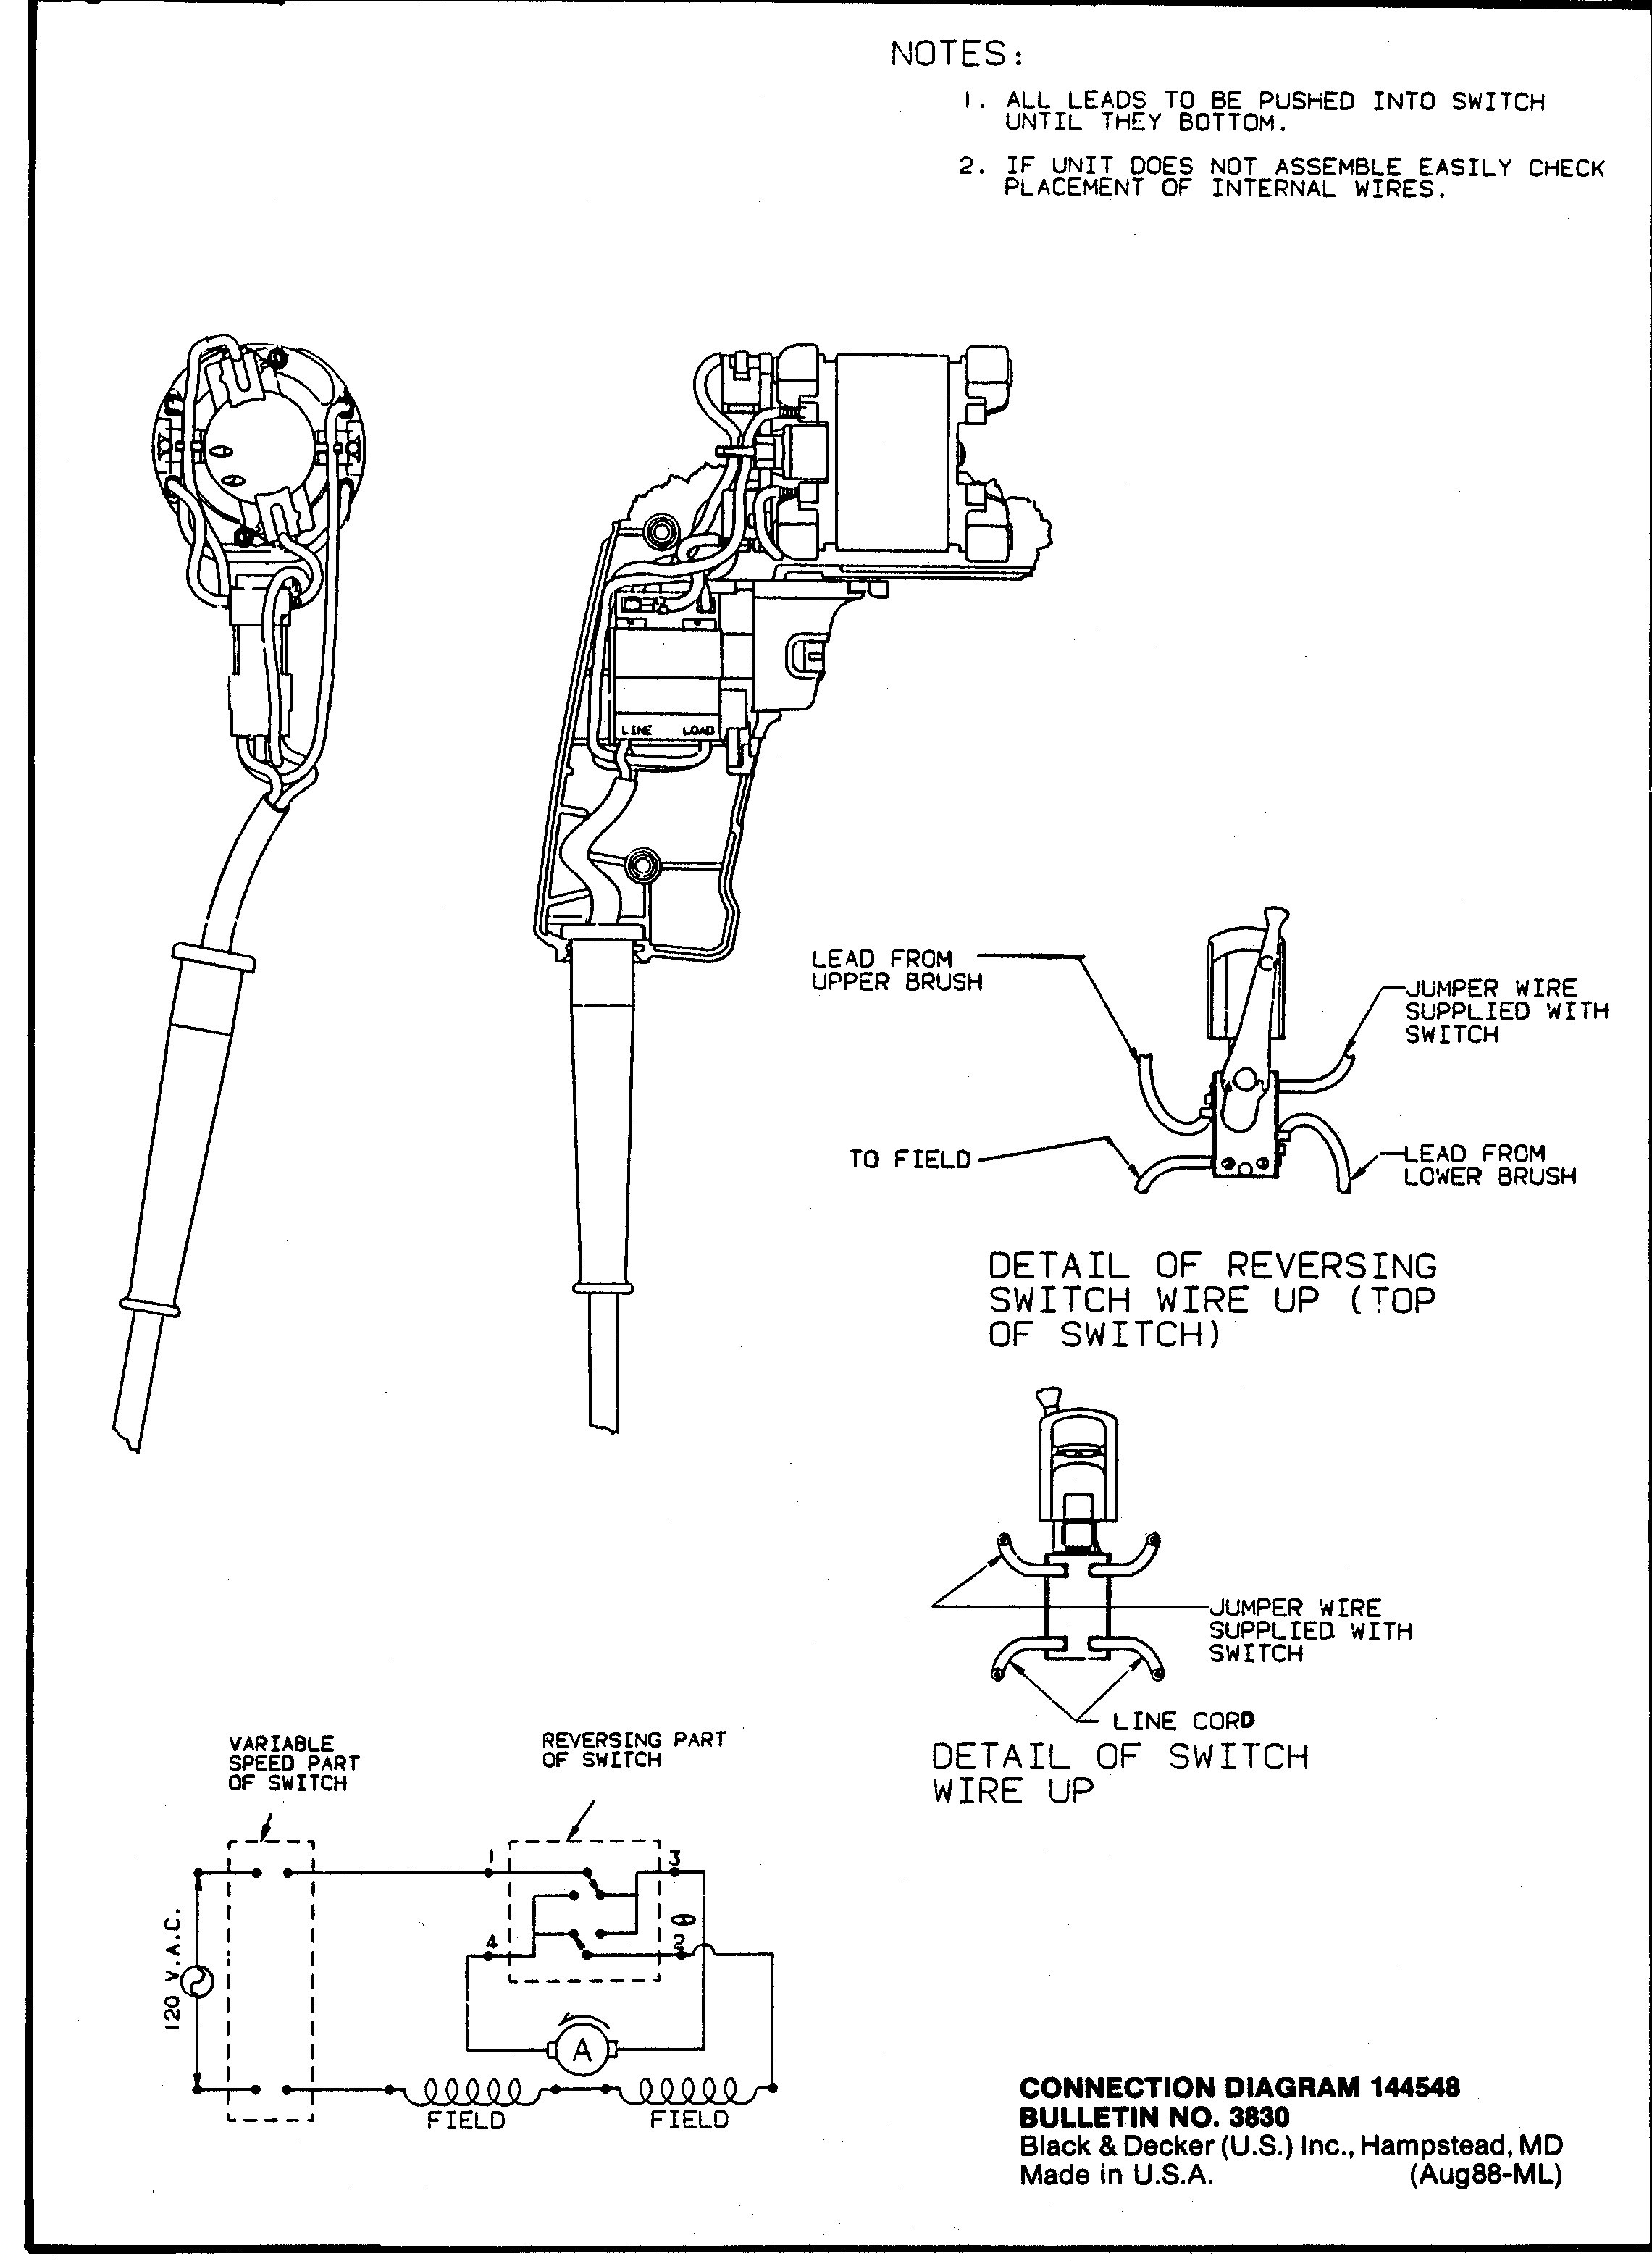 Jumper Cable Diagram New Marathon Electric Motor Wiring Diagram Hbphelp Of Jumper Cable Diagram